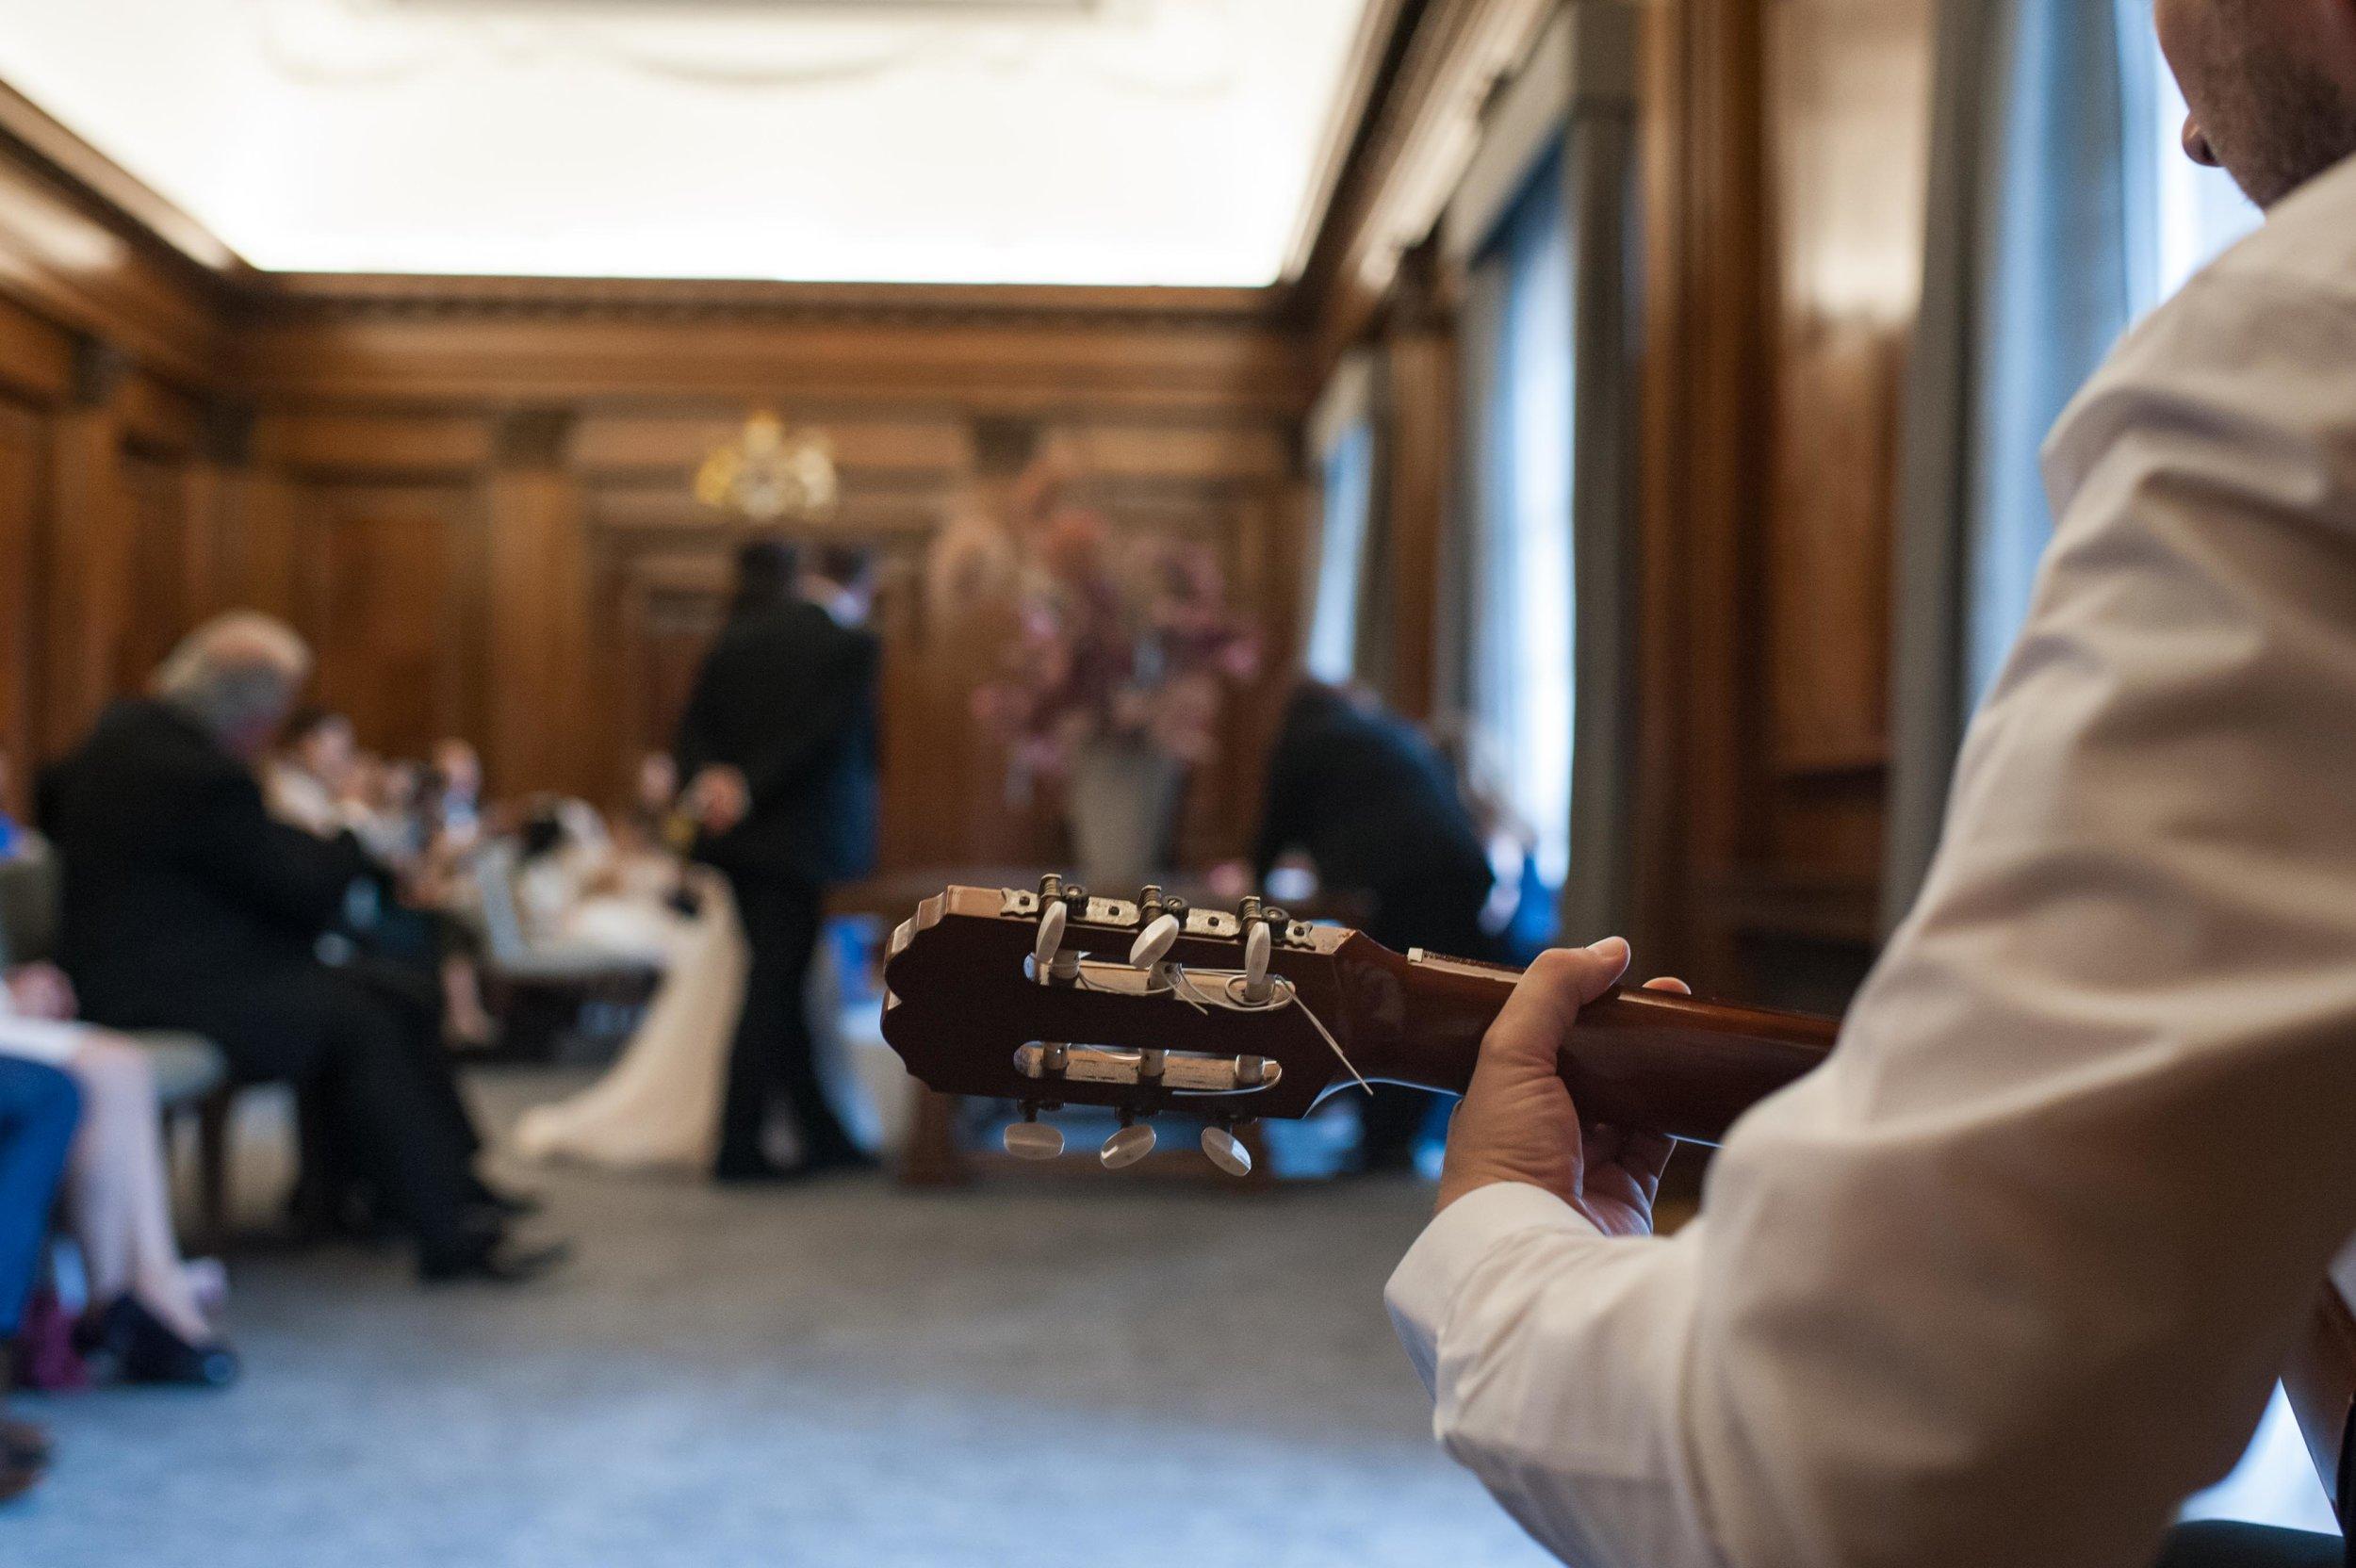 D&M_Marylebone Town Hall Wedding (110 of 239).jpg